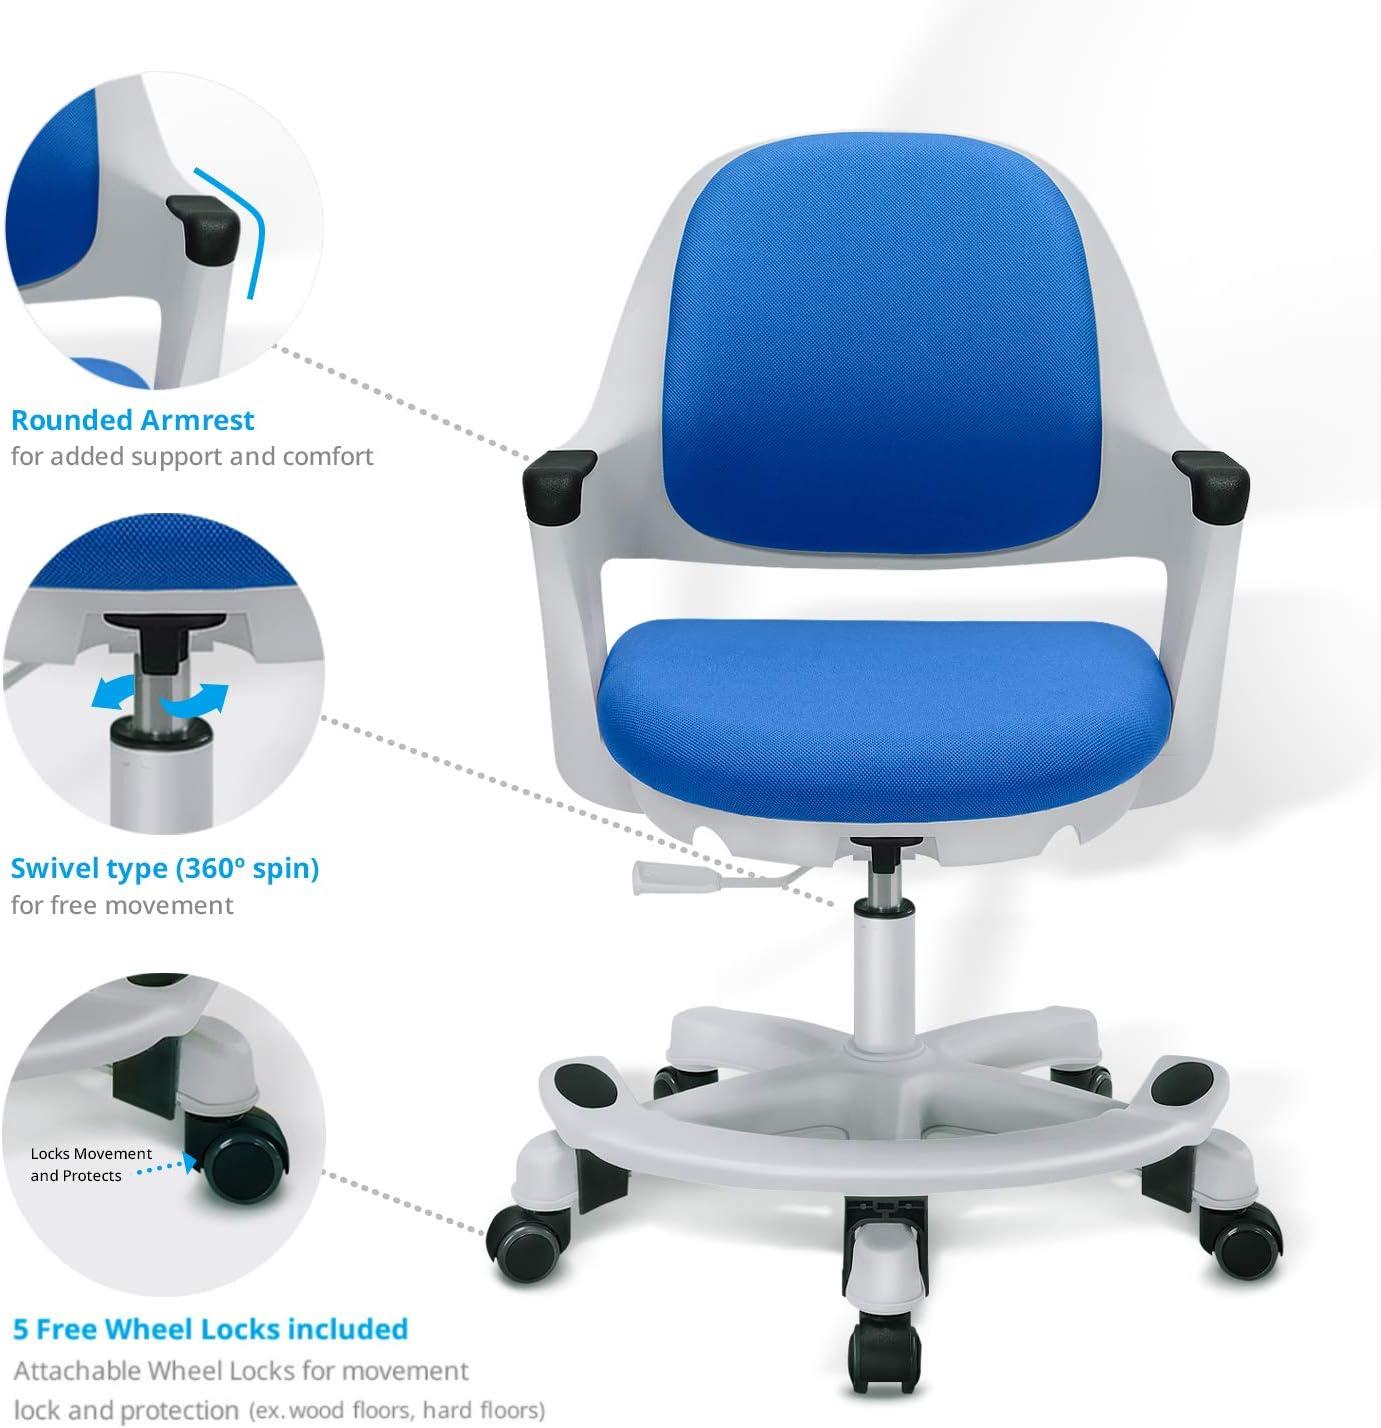 Children S Kids Desk Chair Height Adjustable Seat Control Student Study Office Seat Ocean Blue Amazon De Burobedarf Schreibwaren